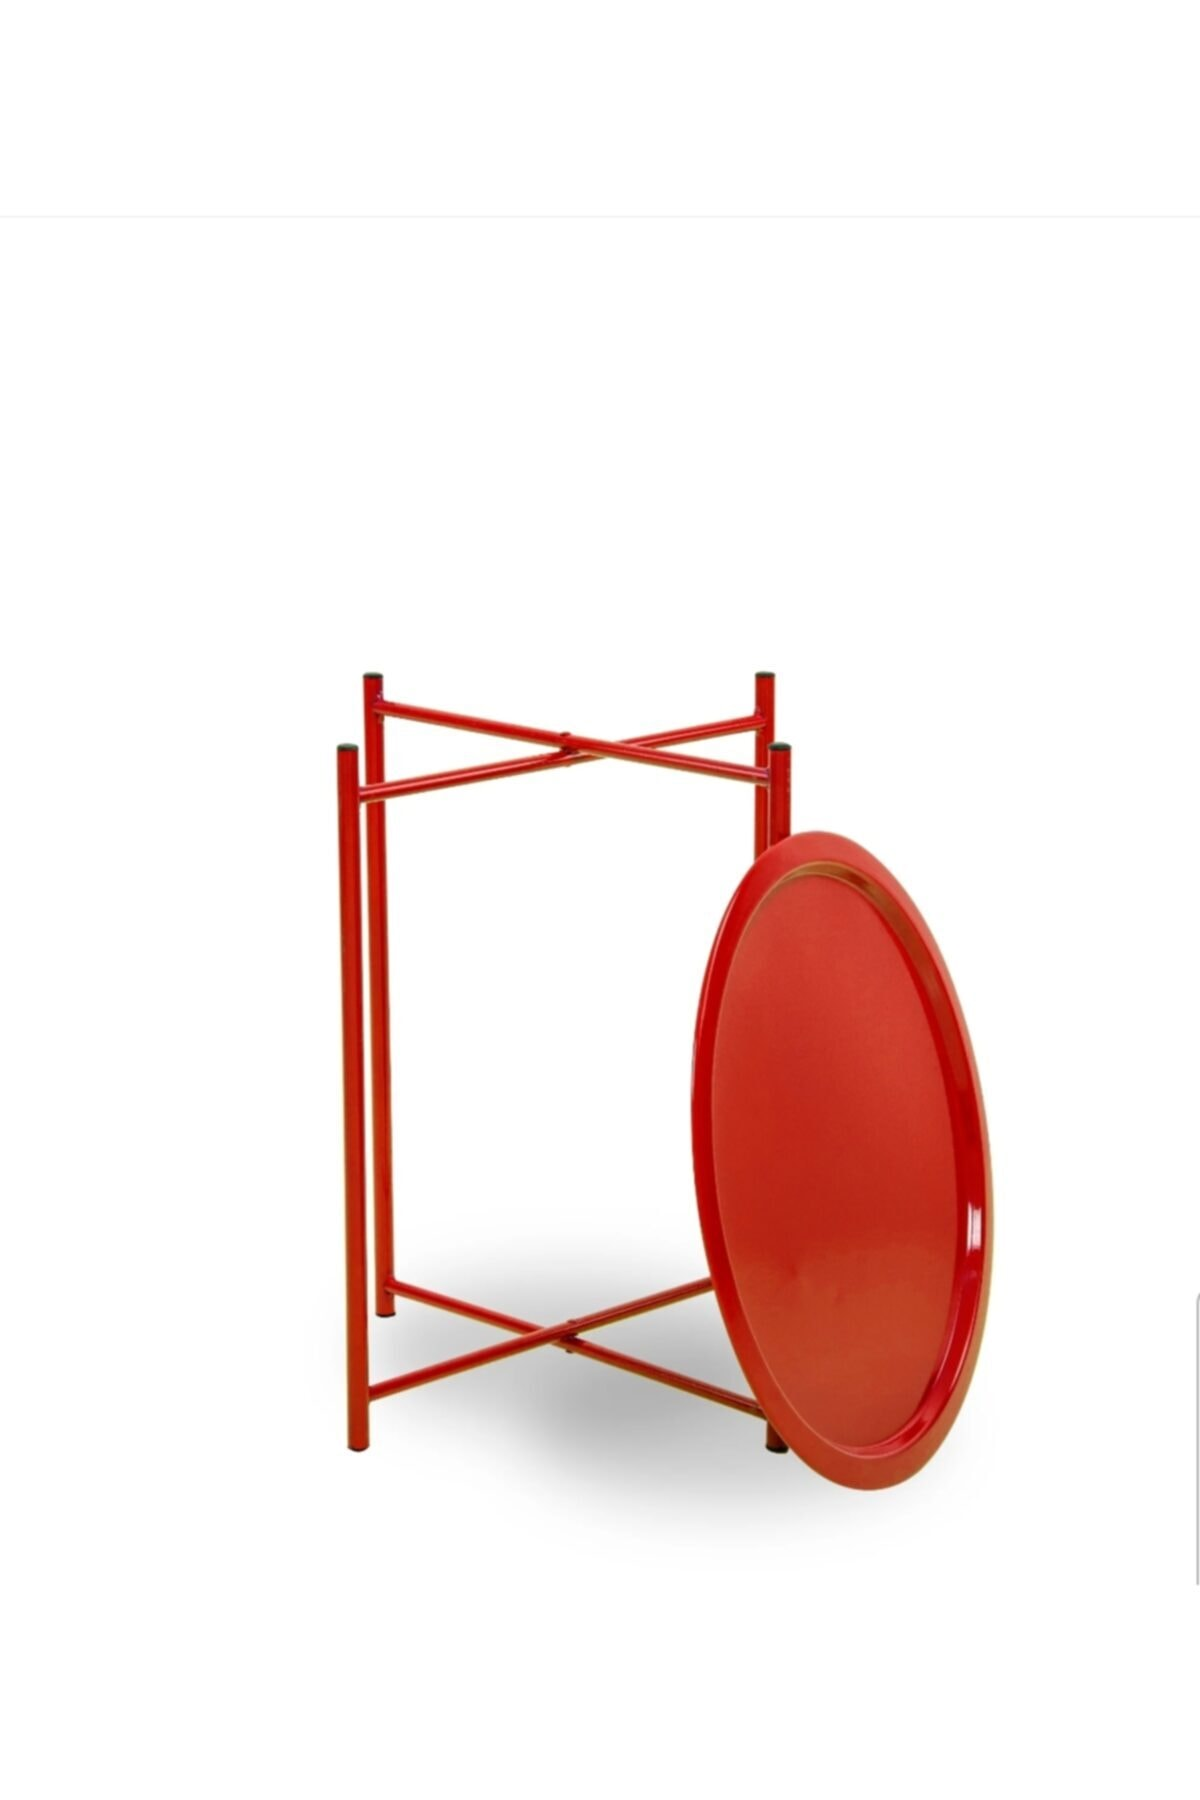 HASTUNÇ Kırmızı İskandinav Katlanır Metal Sehpa 1